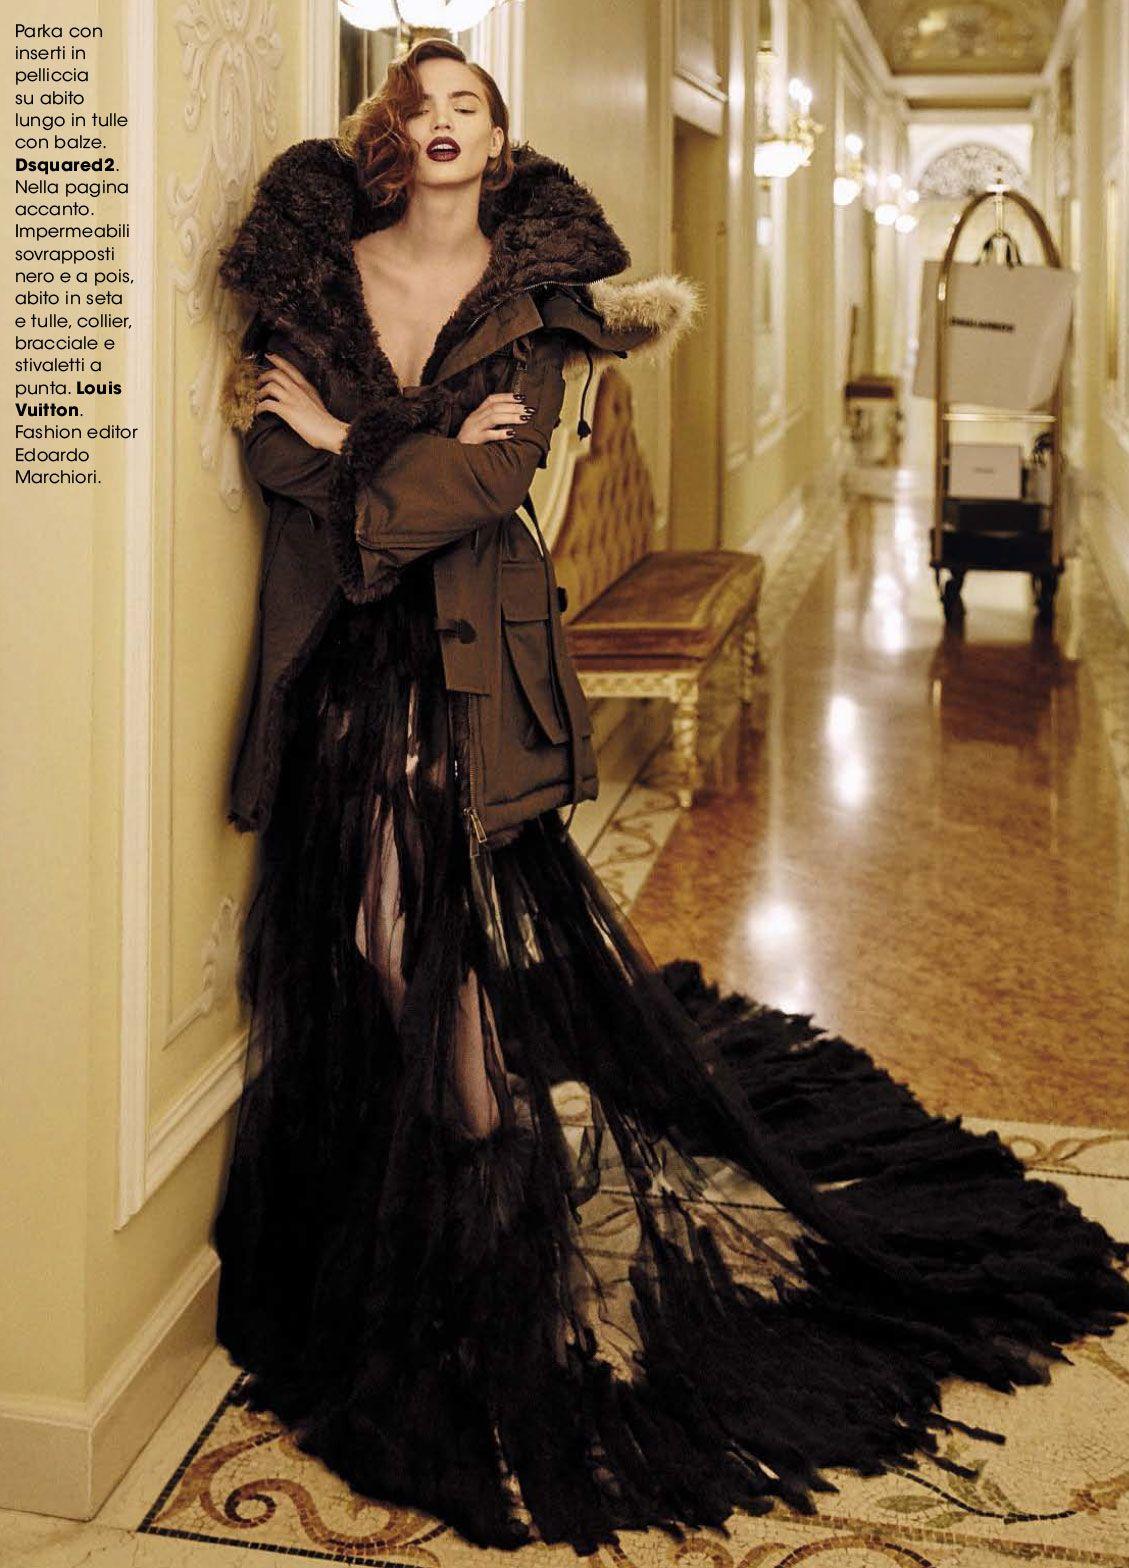 It List! - Dalia Gunther by  Andoni & Arantxa for Glamour Italia October 2015